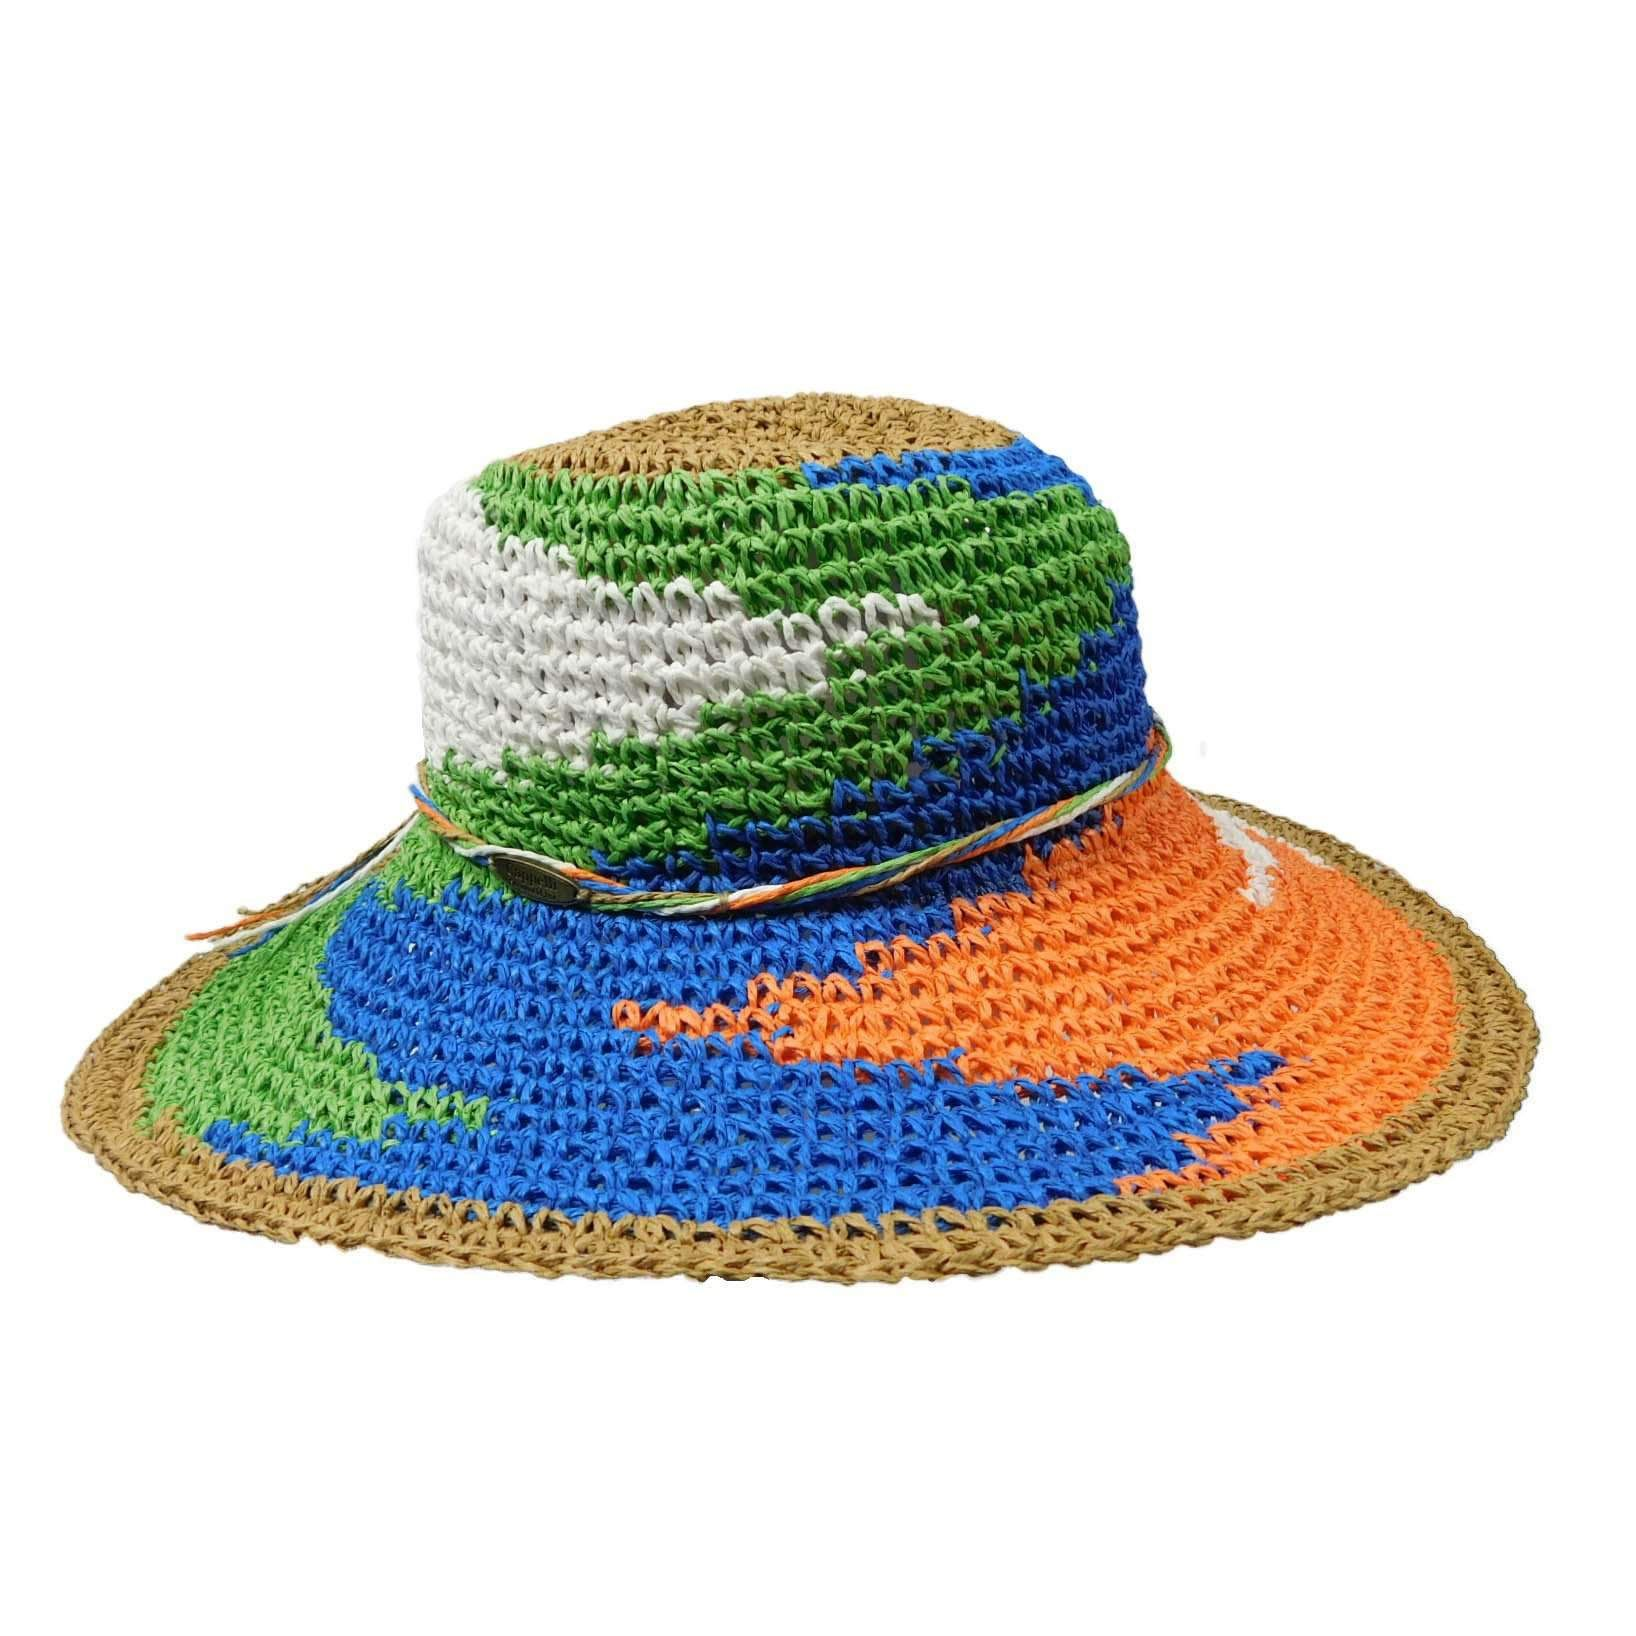 296d57850640c Hand Crocheted Toyo Floppy — SetarTrading Hats